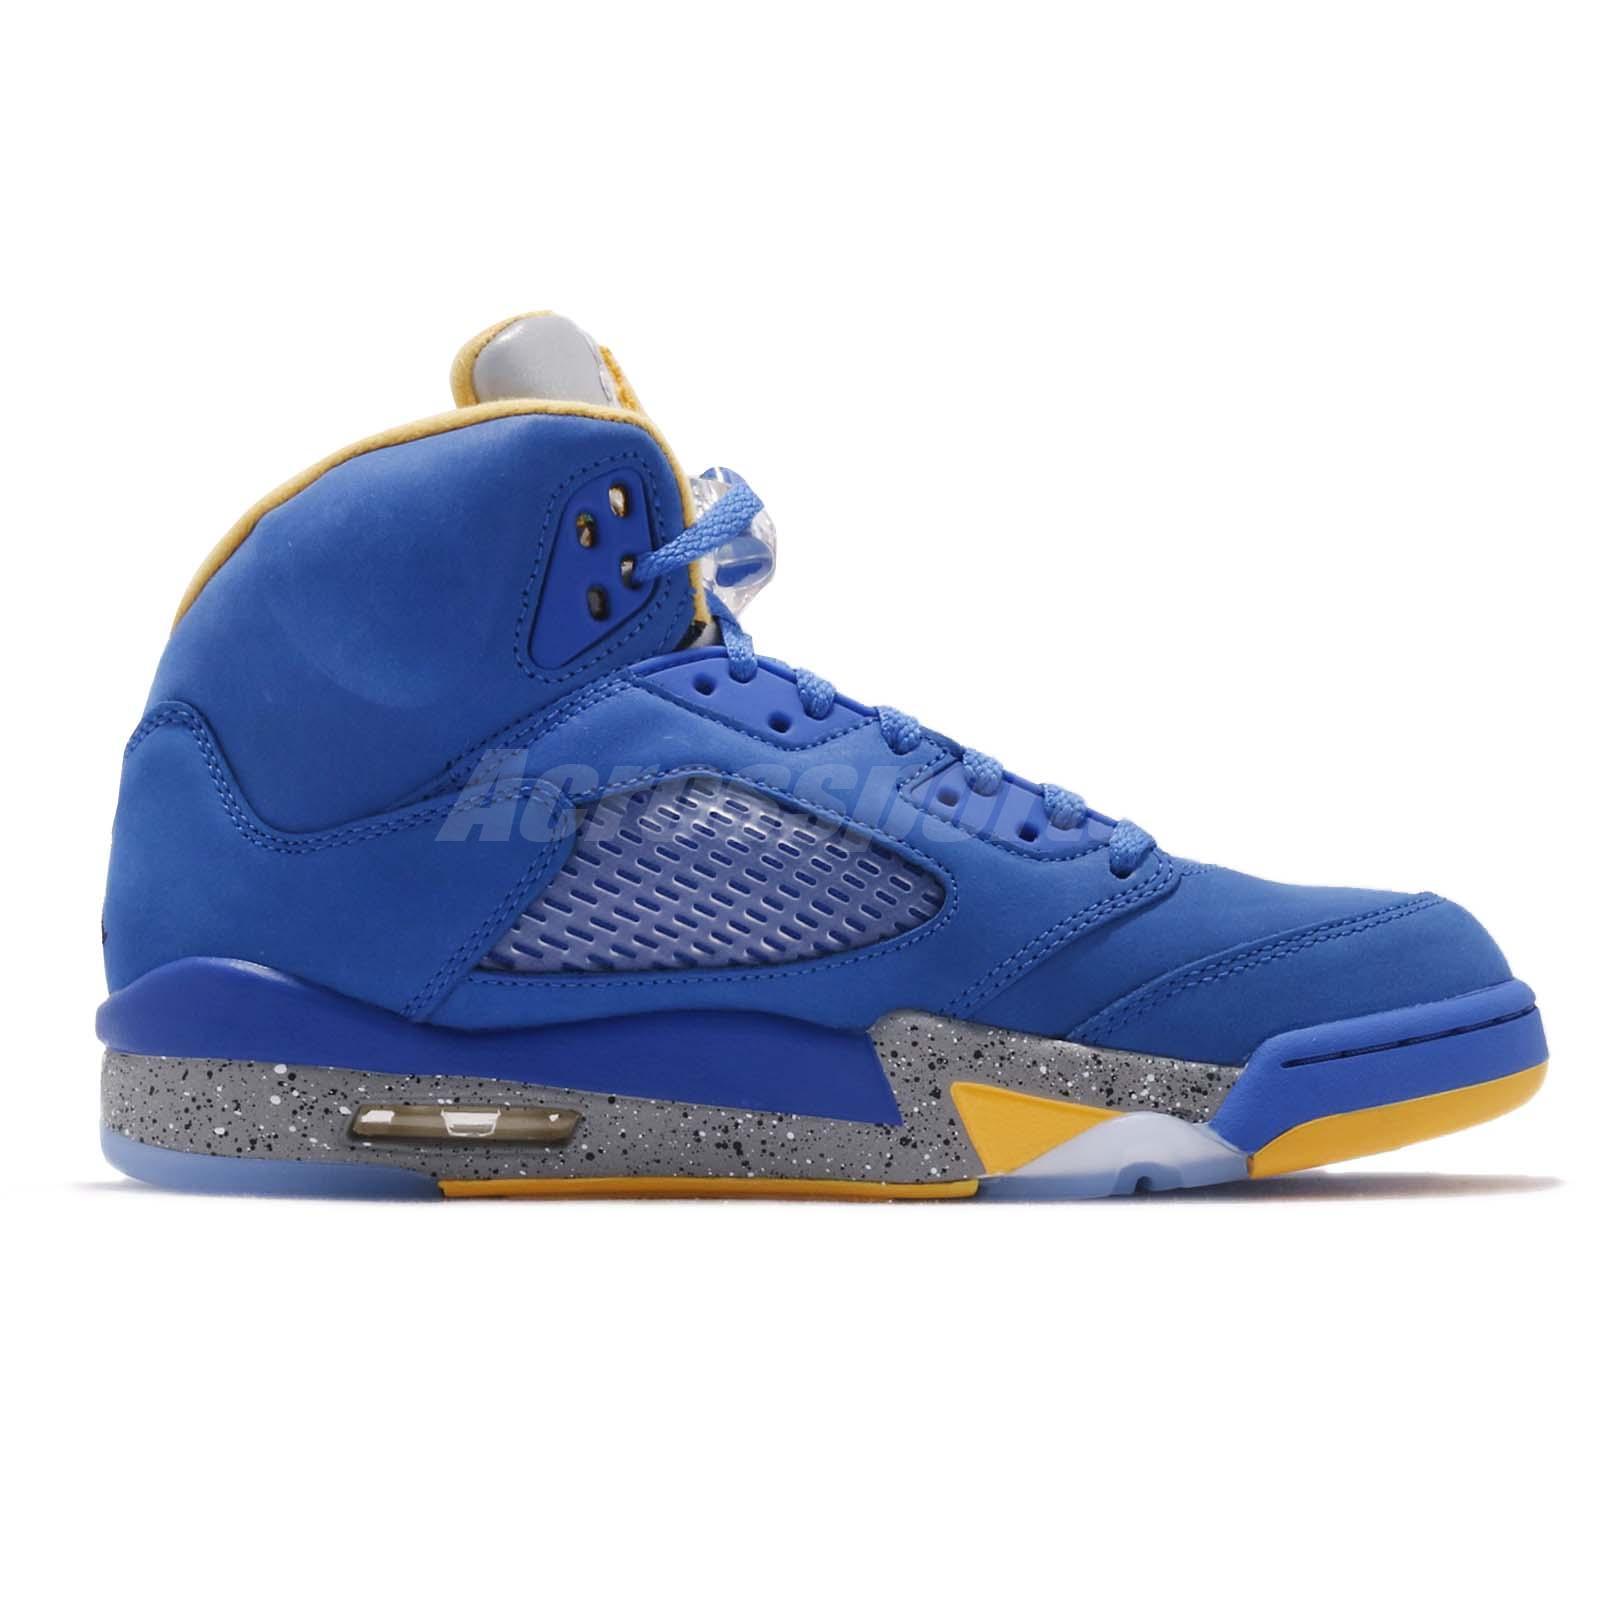 cfc82fe7a27bf0 Nike Air Jordan 5 Laney JSP V Varsity Royal Maize Blue Yellow CD2720 ...